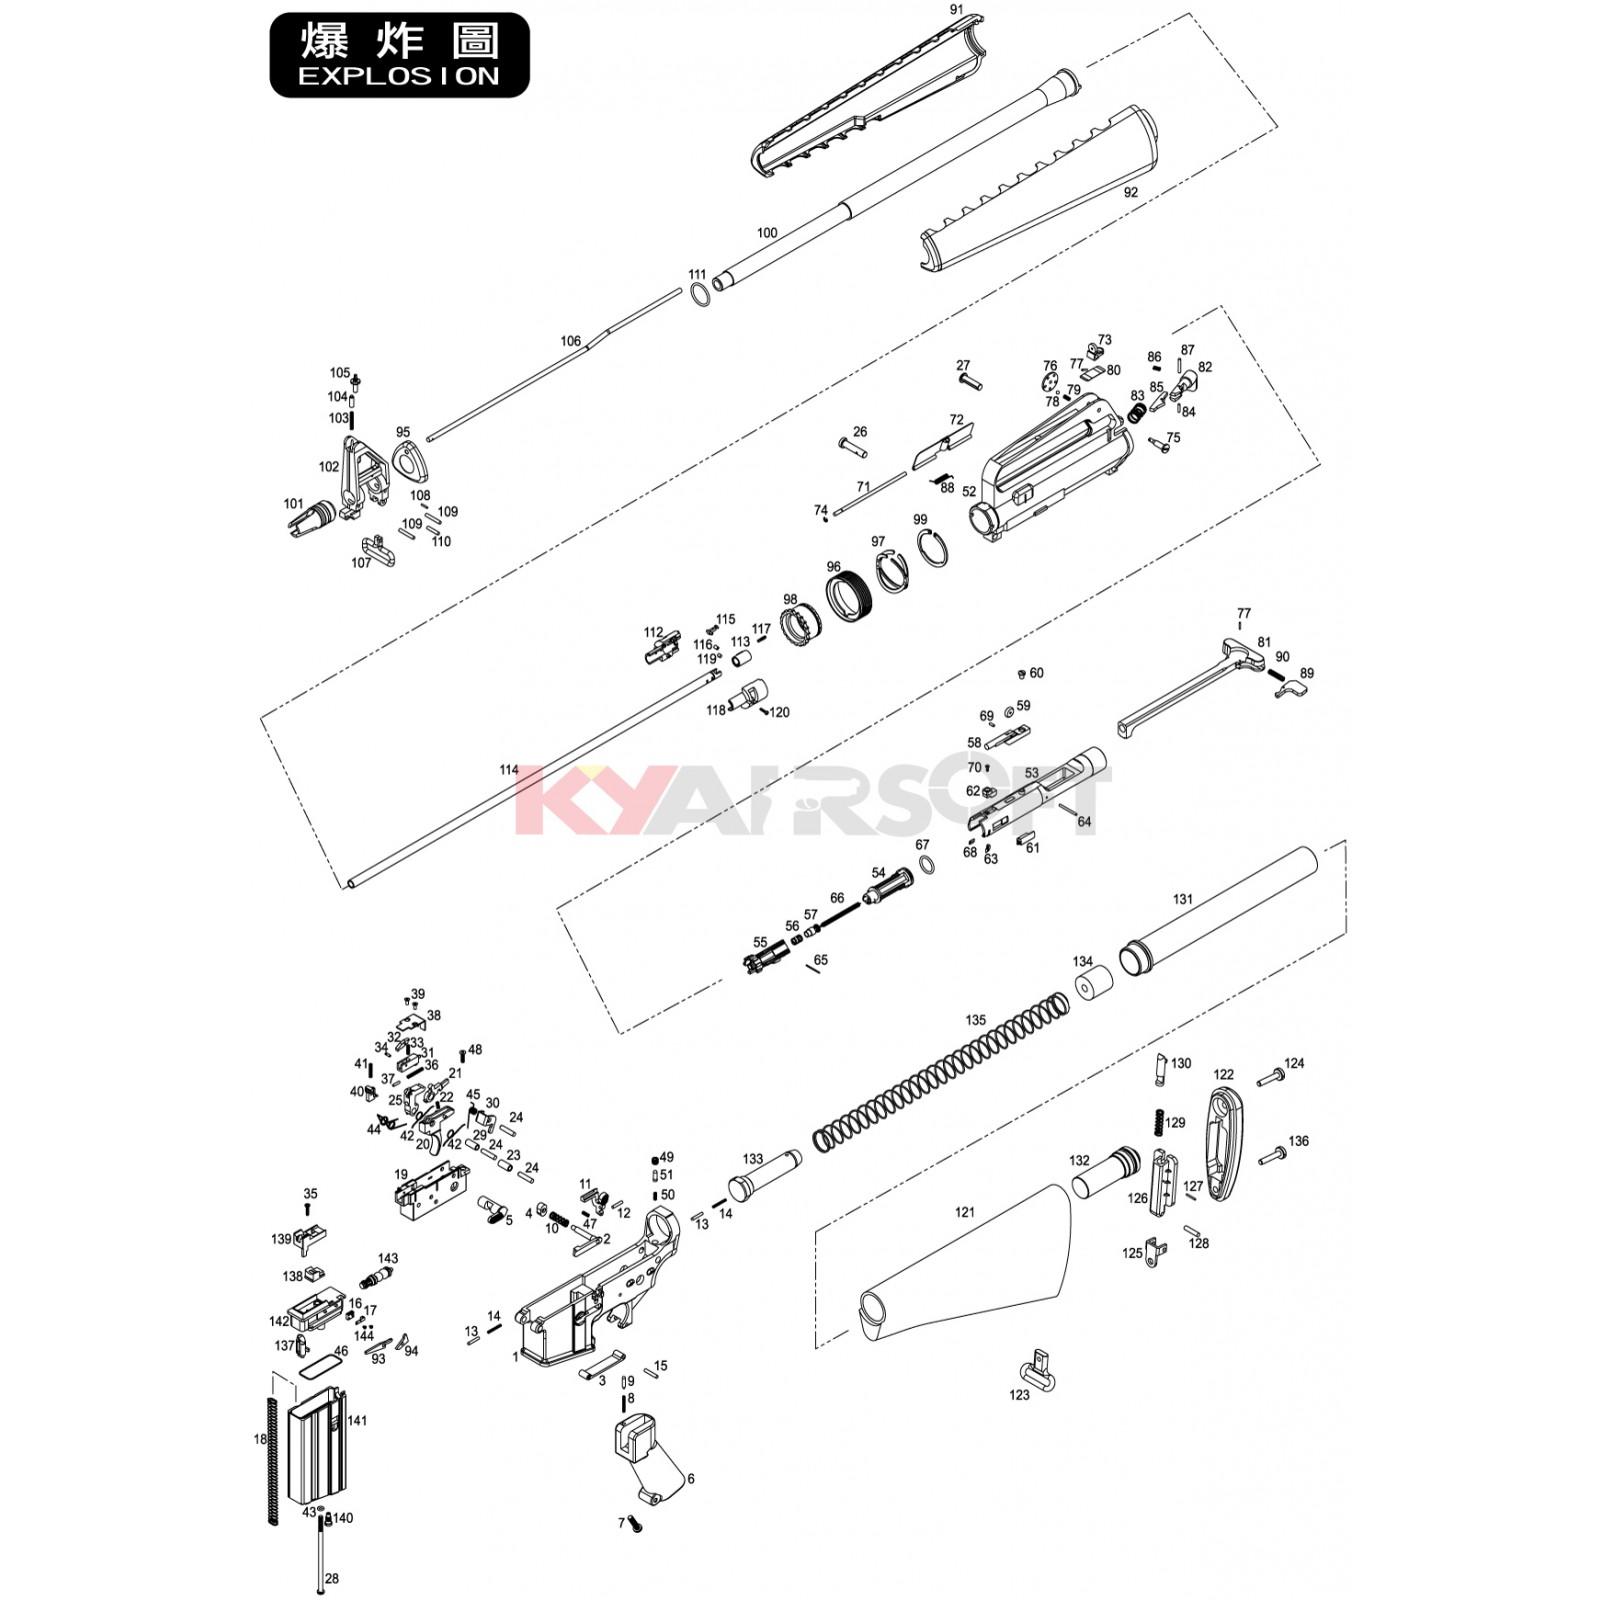 M16 A1 1 M16 Lower Receiver Gbbr